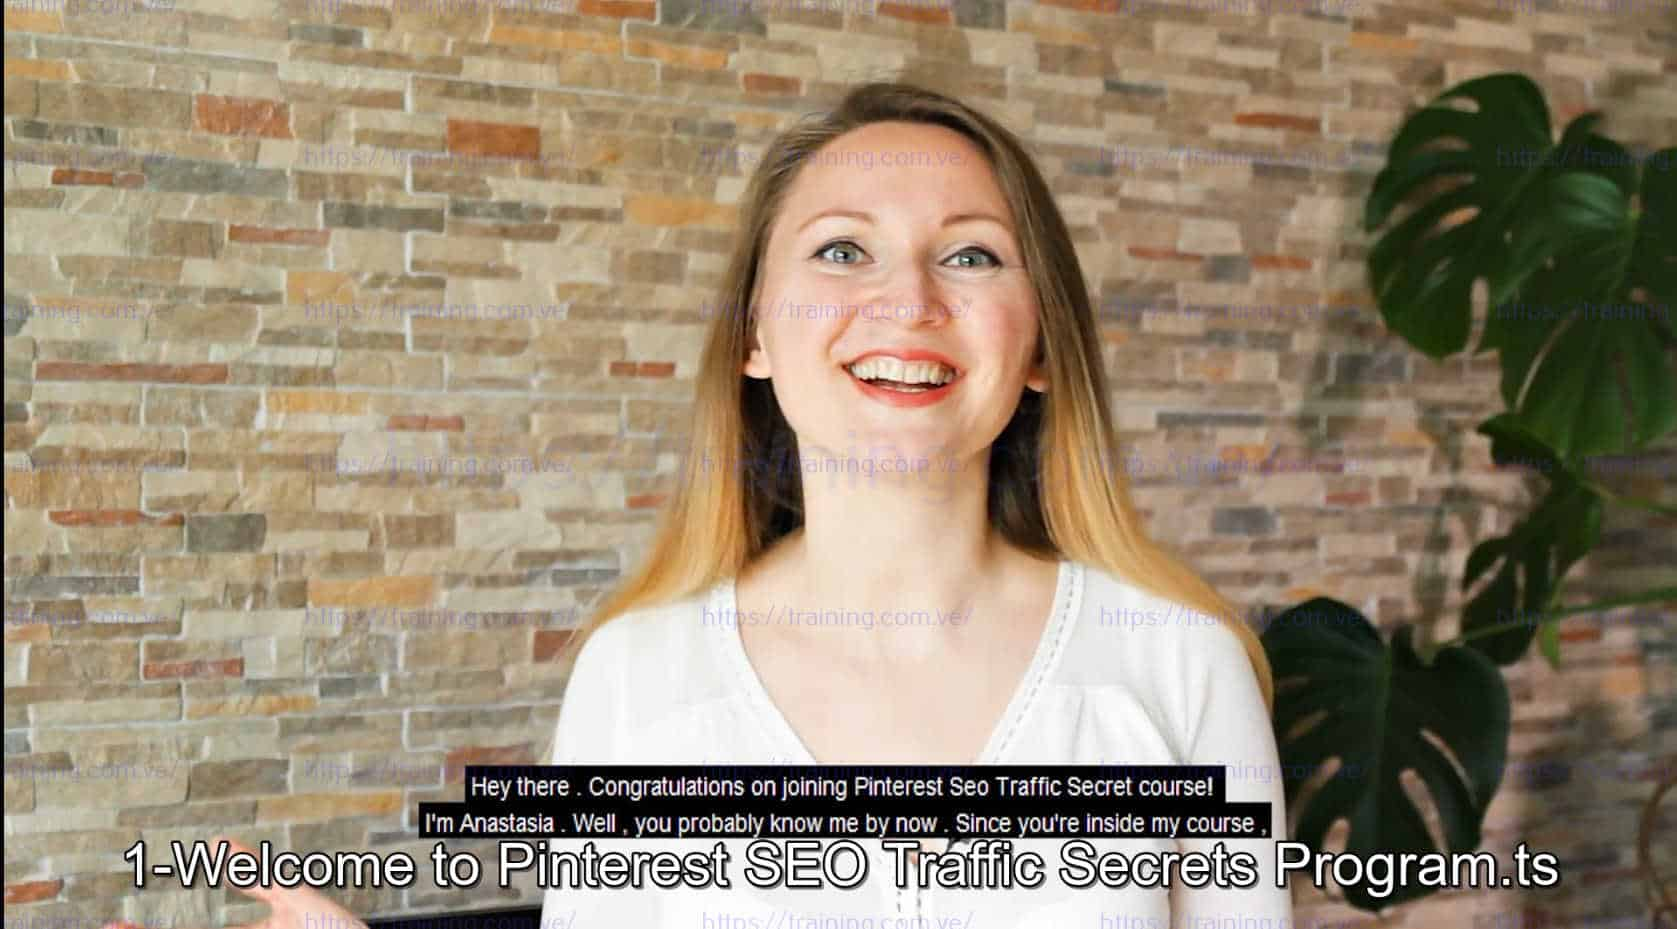 Pinterest SEO Traffic Secrets 2019 by Anastasia Blogger Coupon